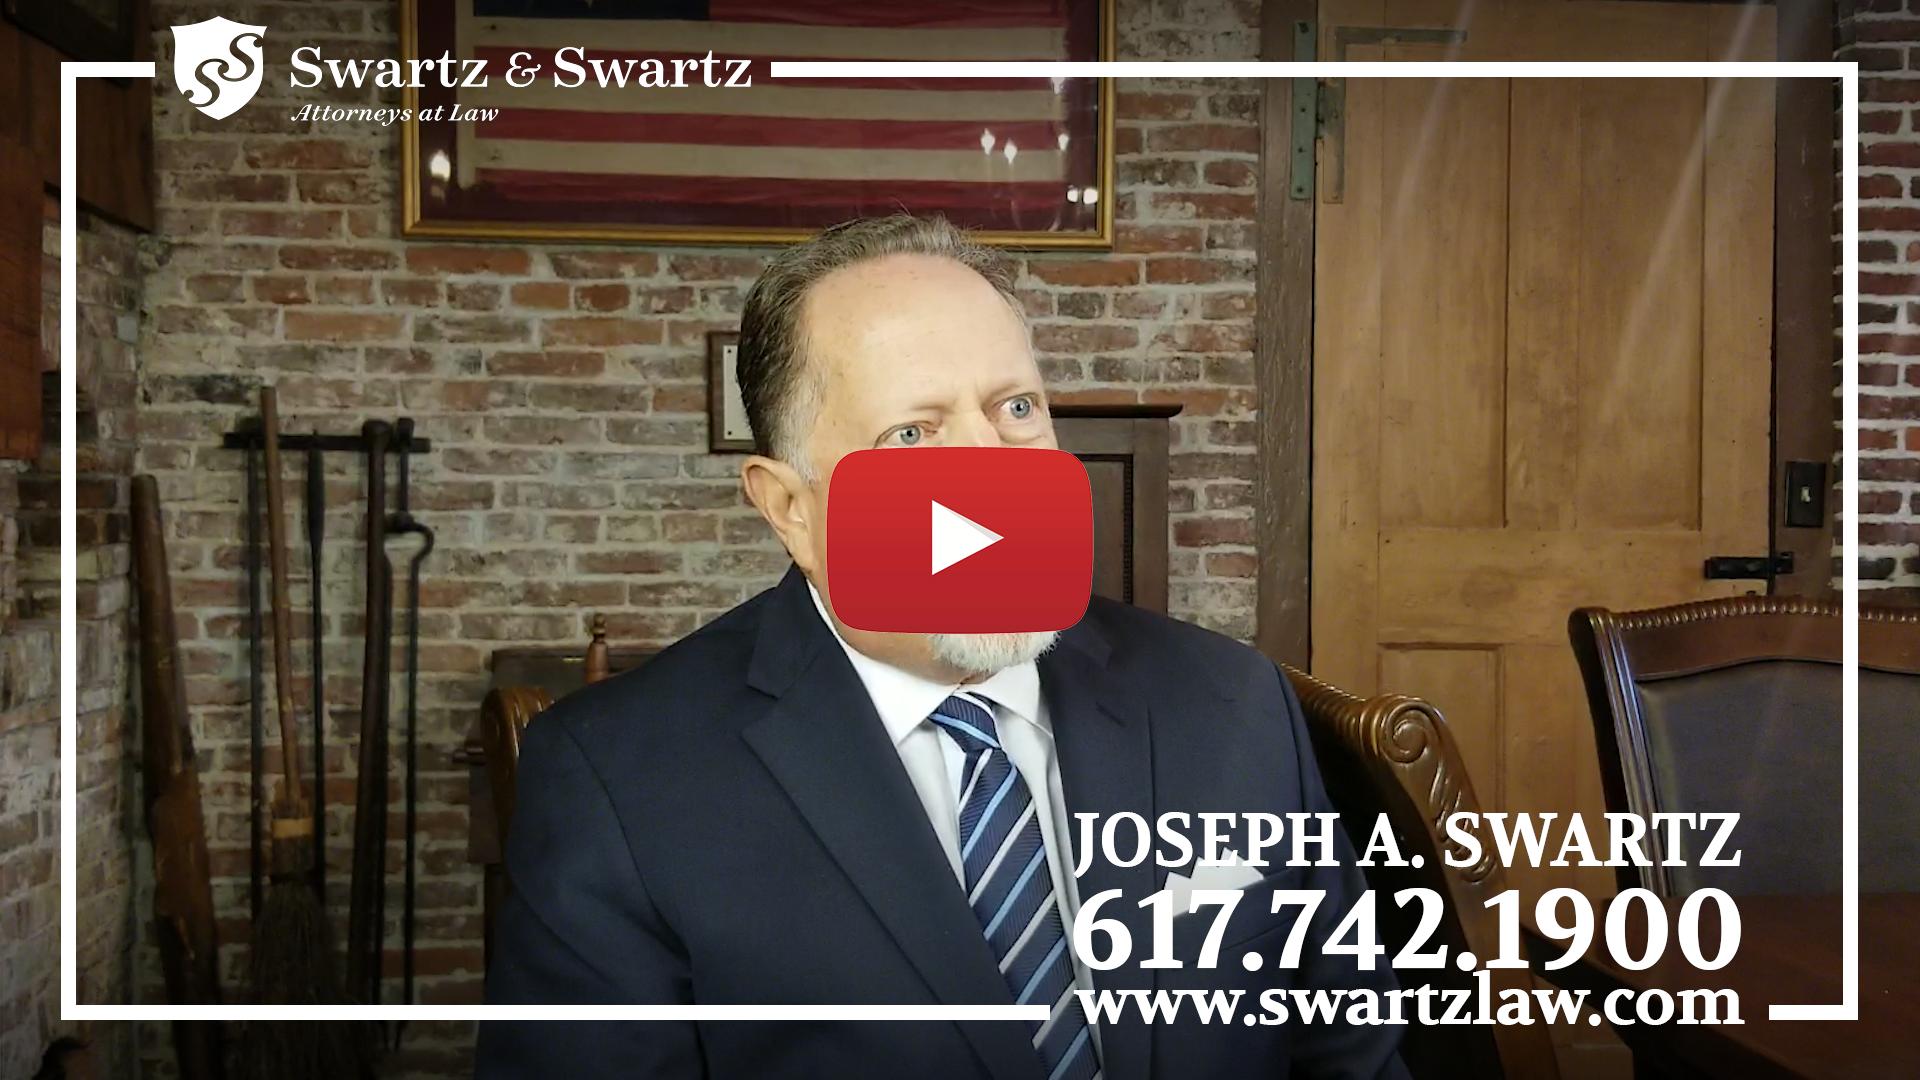 Joseph Swartz, discusses the dangers of recreational vehicles and the extensive experience of Swartz & Swartz P.C.